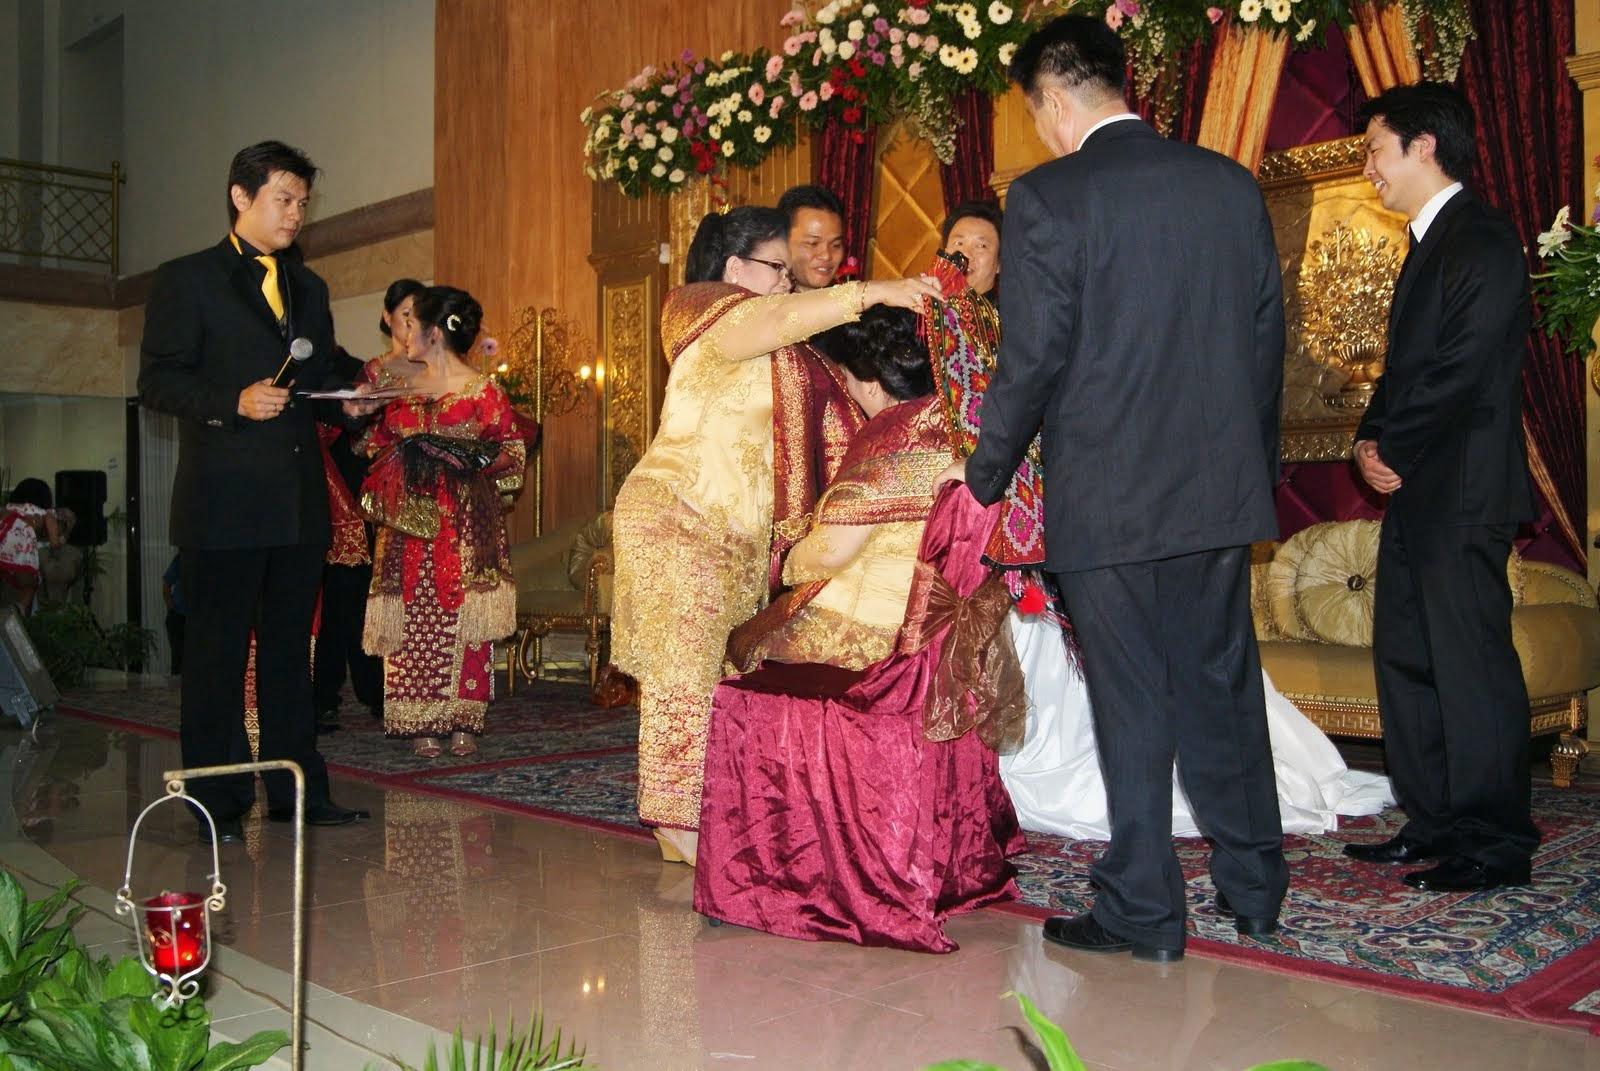 First Three Parts of Batak Toba Wedding - Lusius Sinurat